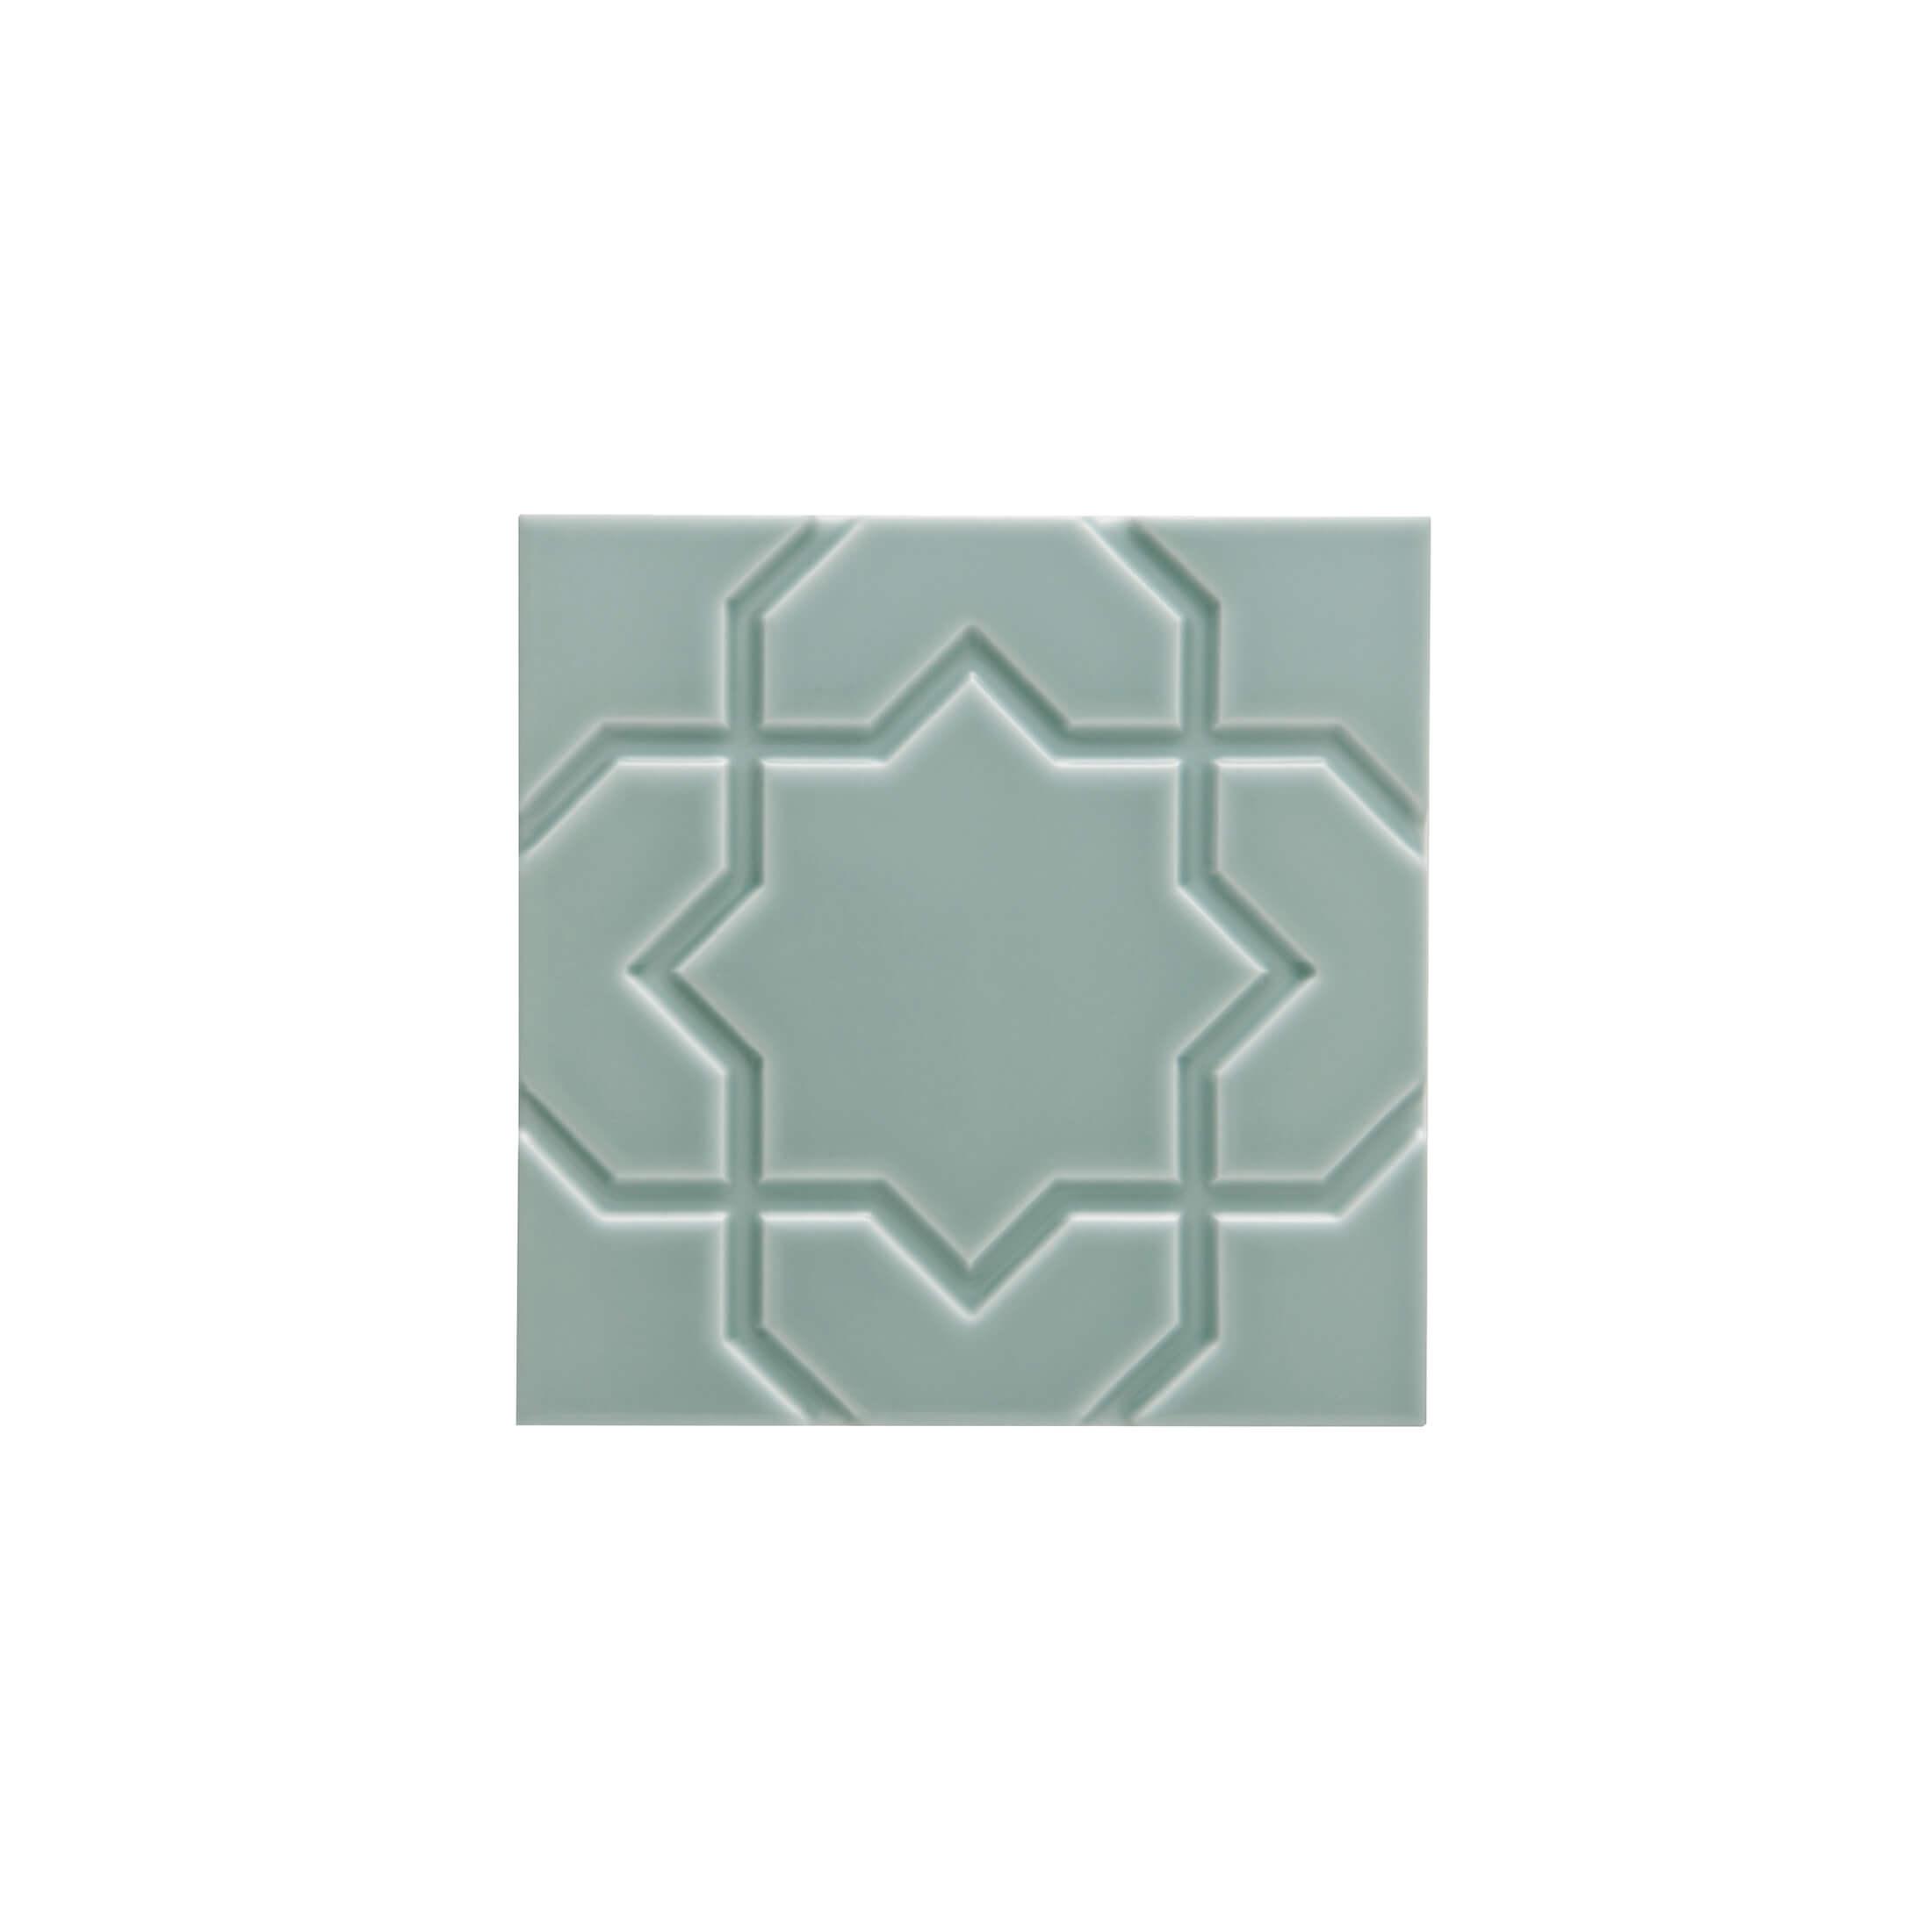 ADNE4149 - LISO STAR - 15 cm X 15 cm